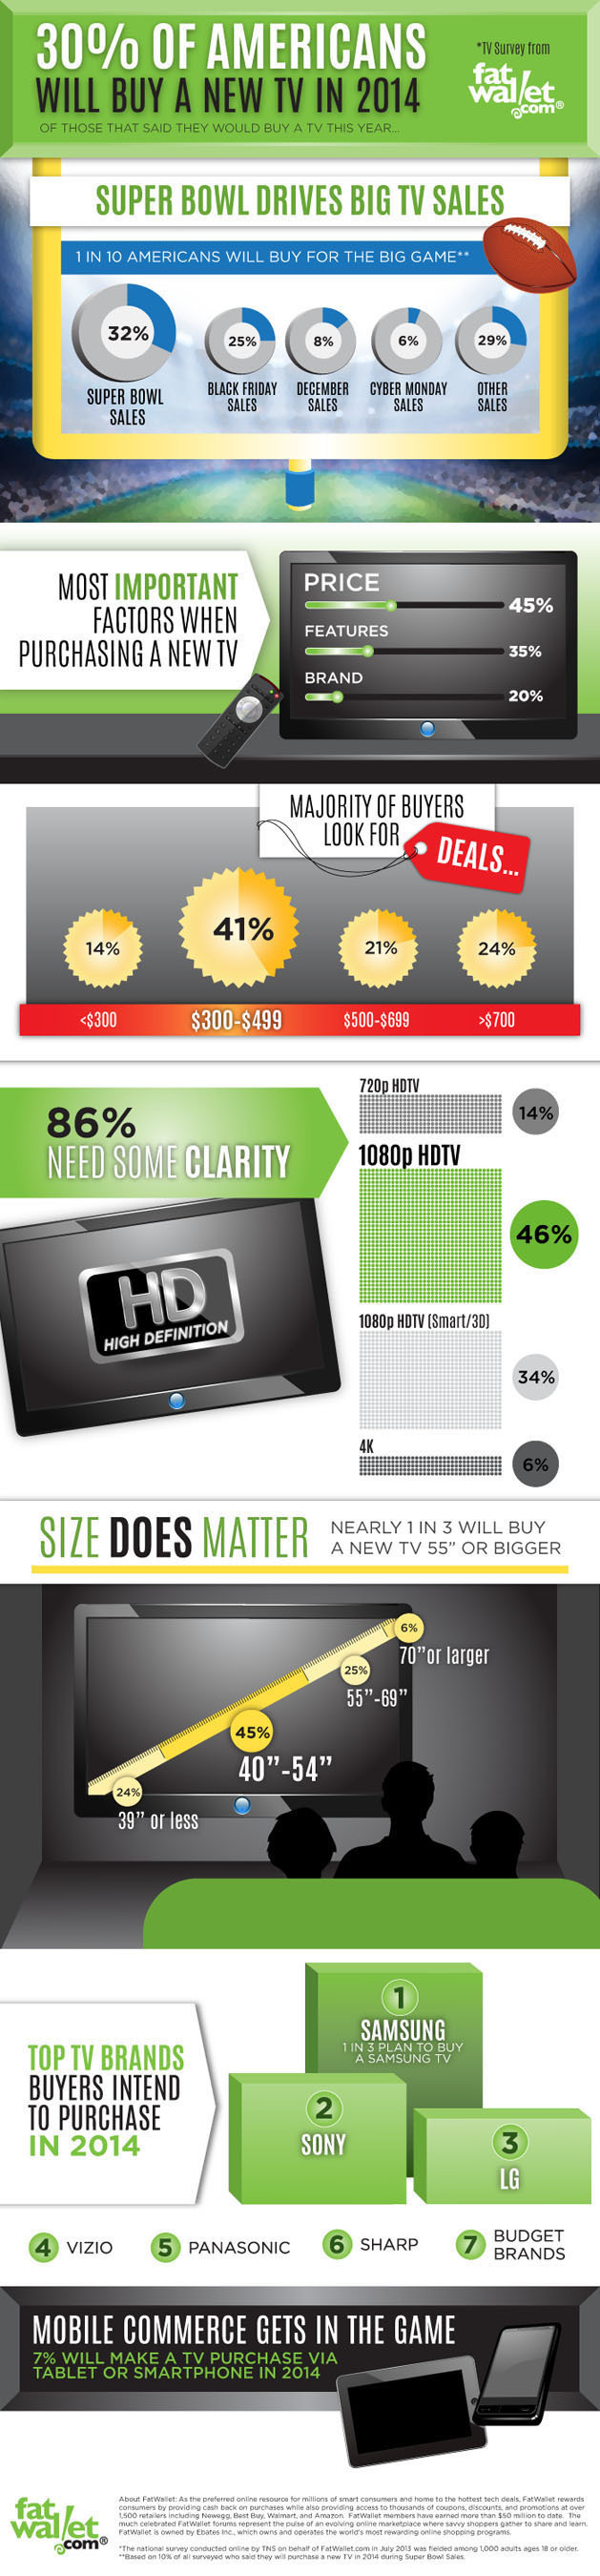 INFOGRAPHIC: TV Buyers Survey 2014. (PRNewsFoto/FatWallet) (PRNewsFoto/FATWALLET)